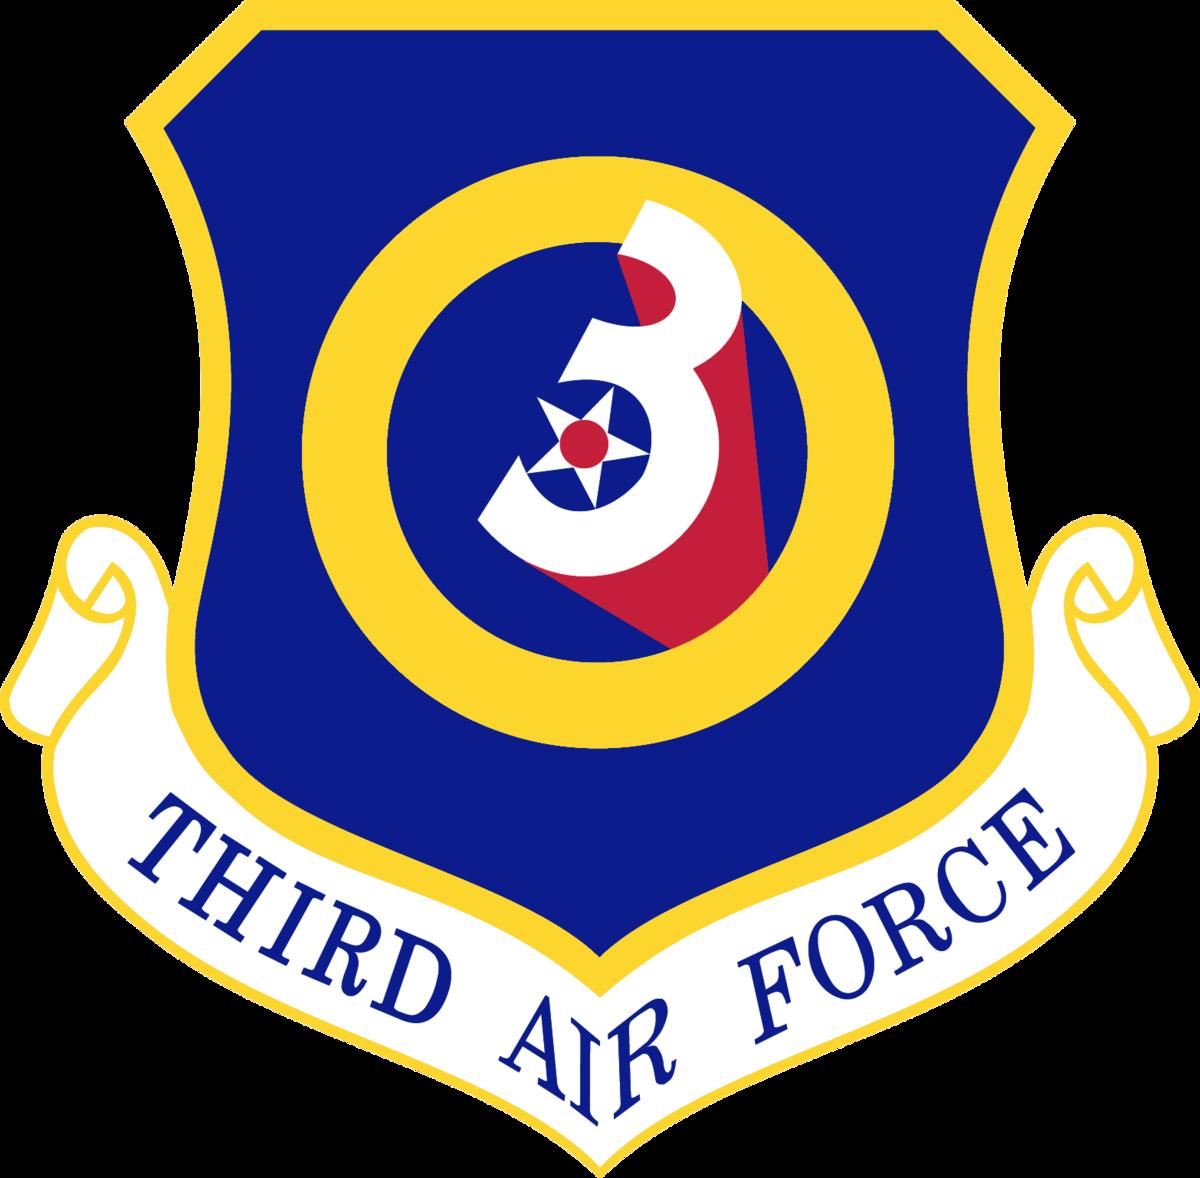 Air Force Af Microsoft Home Use Program Code